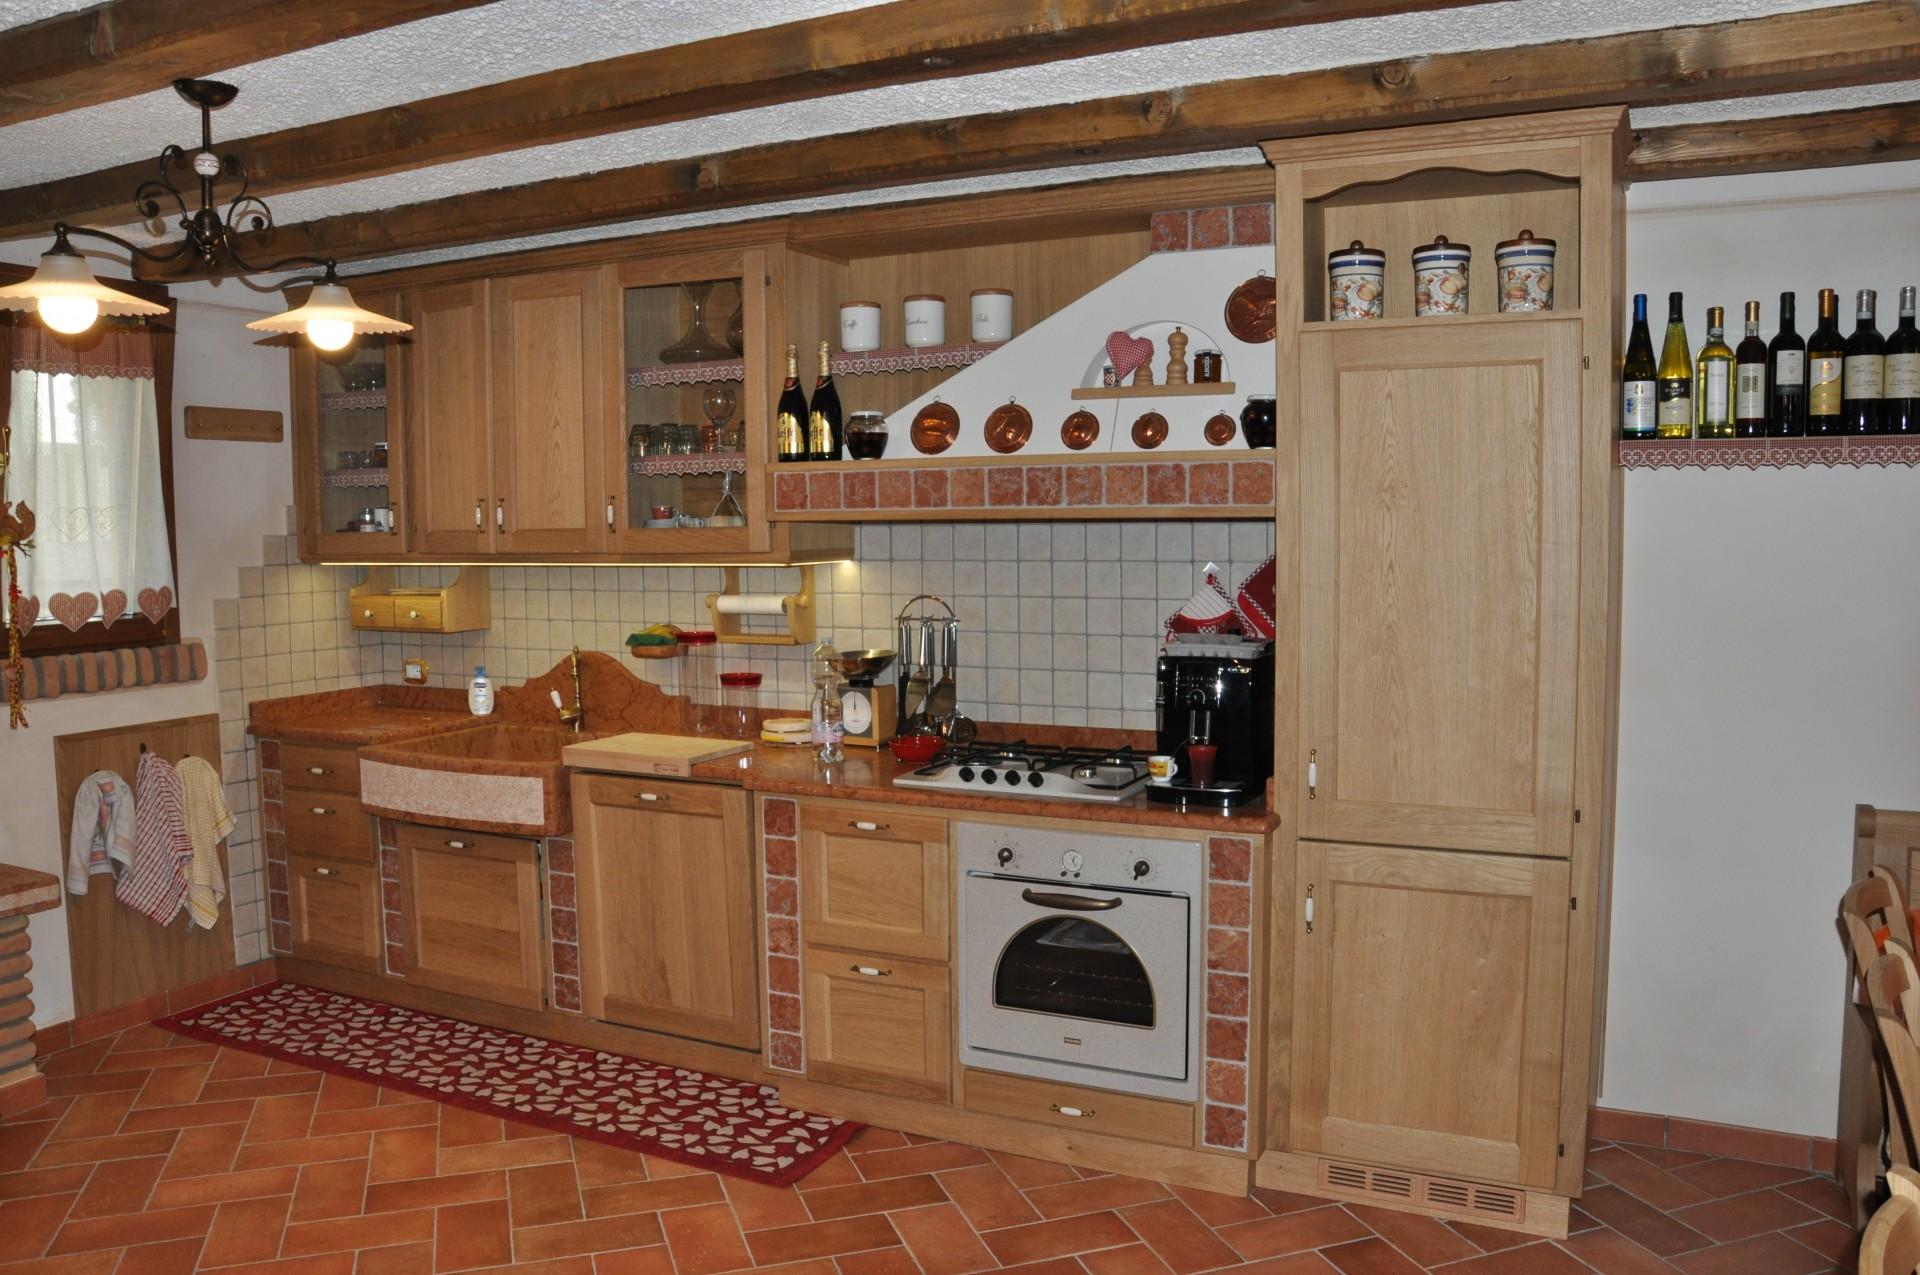 Cucina rustica con isola wr67 regardsdefemmes - Mobili in stile cerea ...